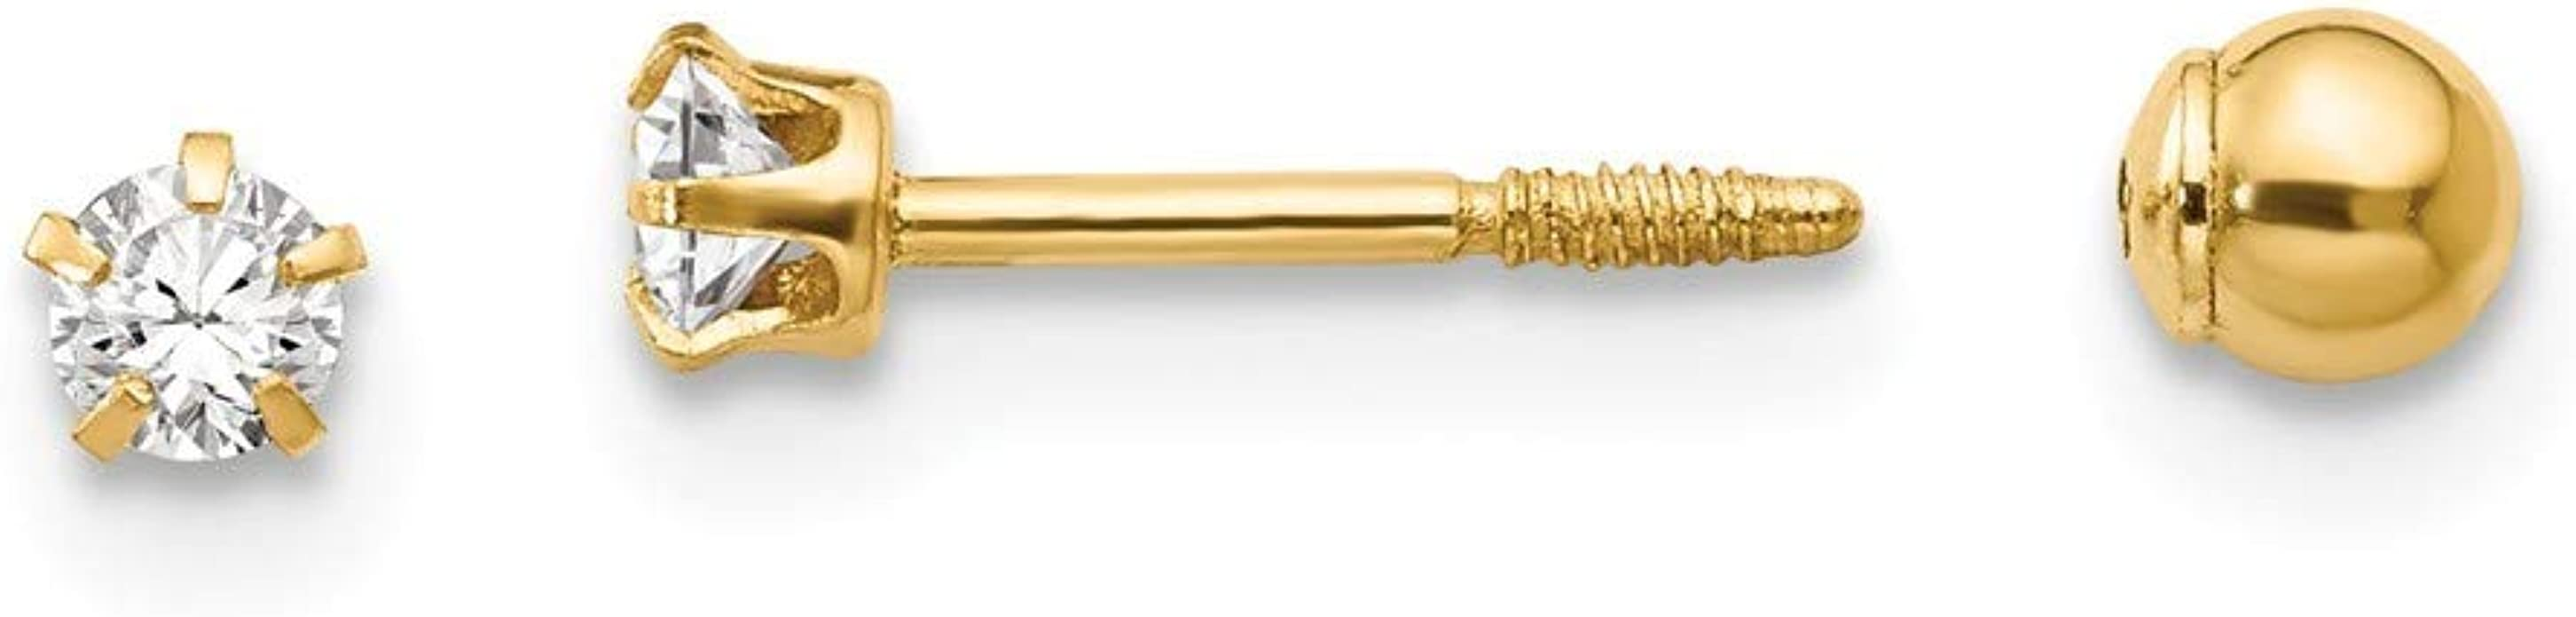 14K Yellow Gold Madi K Polished 3mm Ball Screwback Earrings